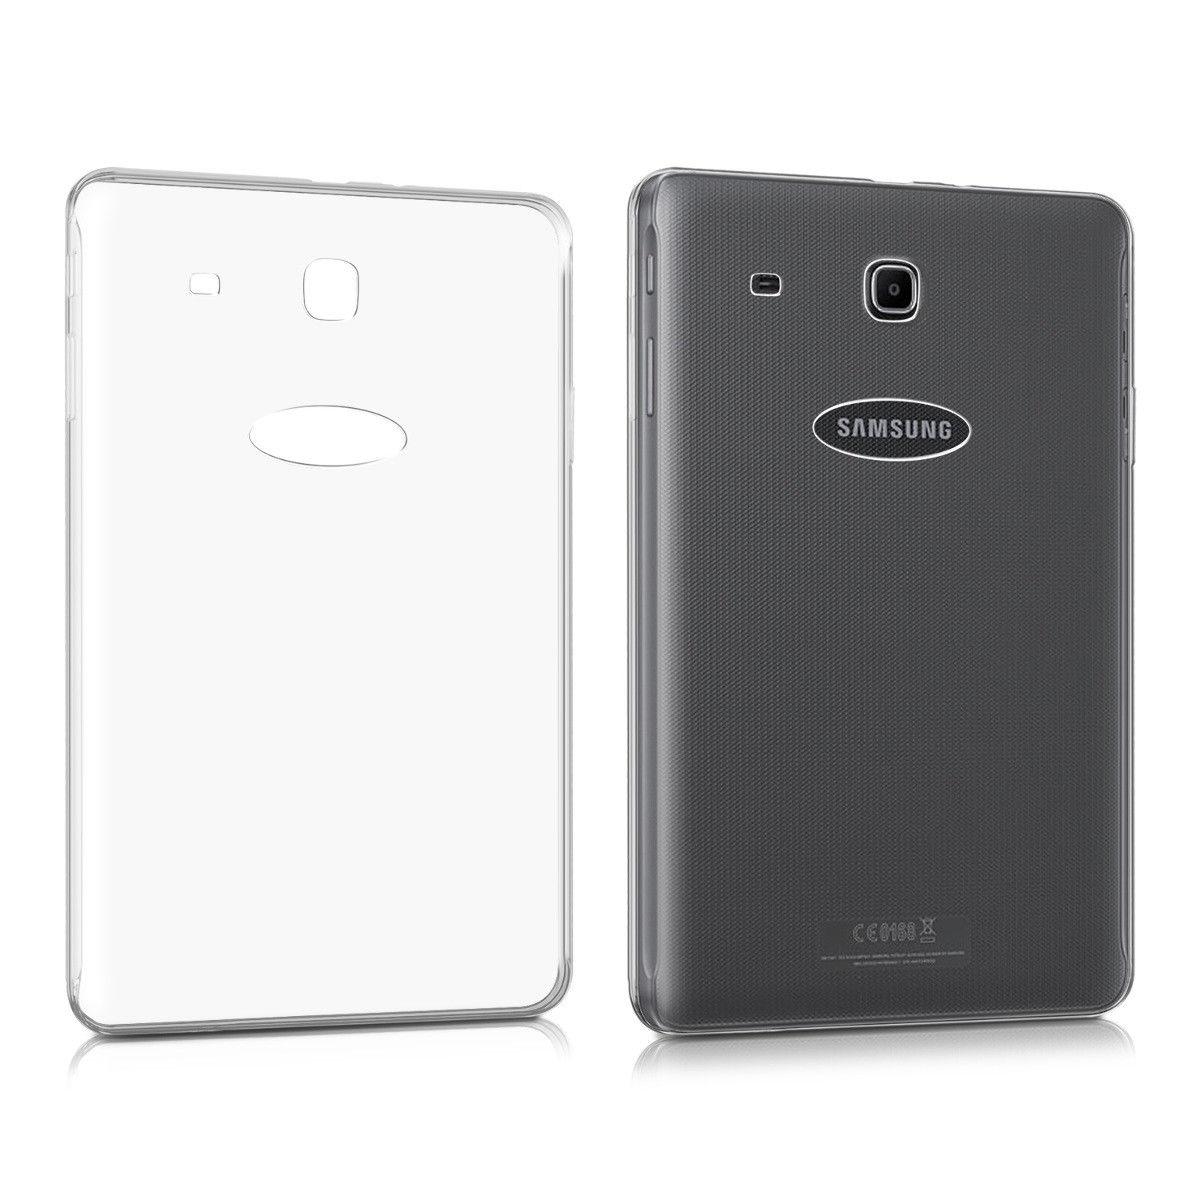 Pouzdro GEL Samsung Galaxy Tab E 9.6